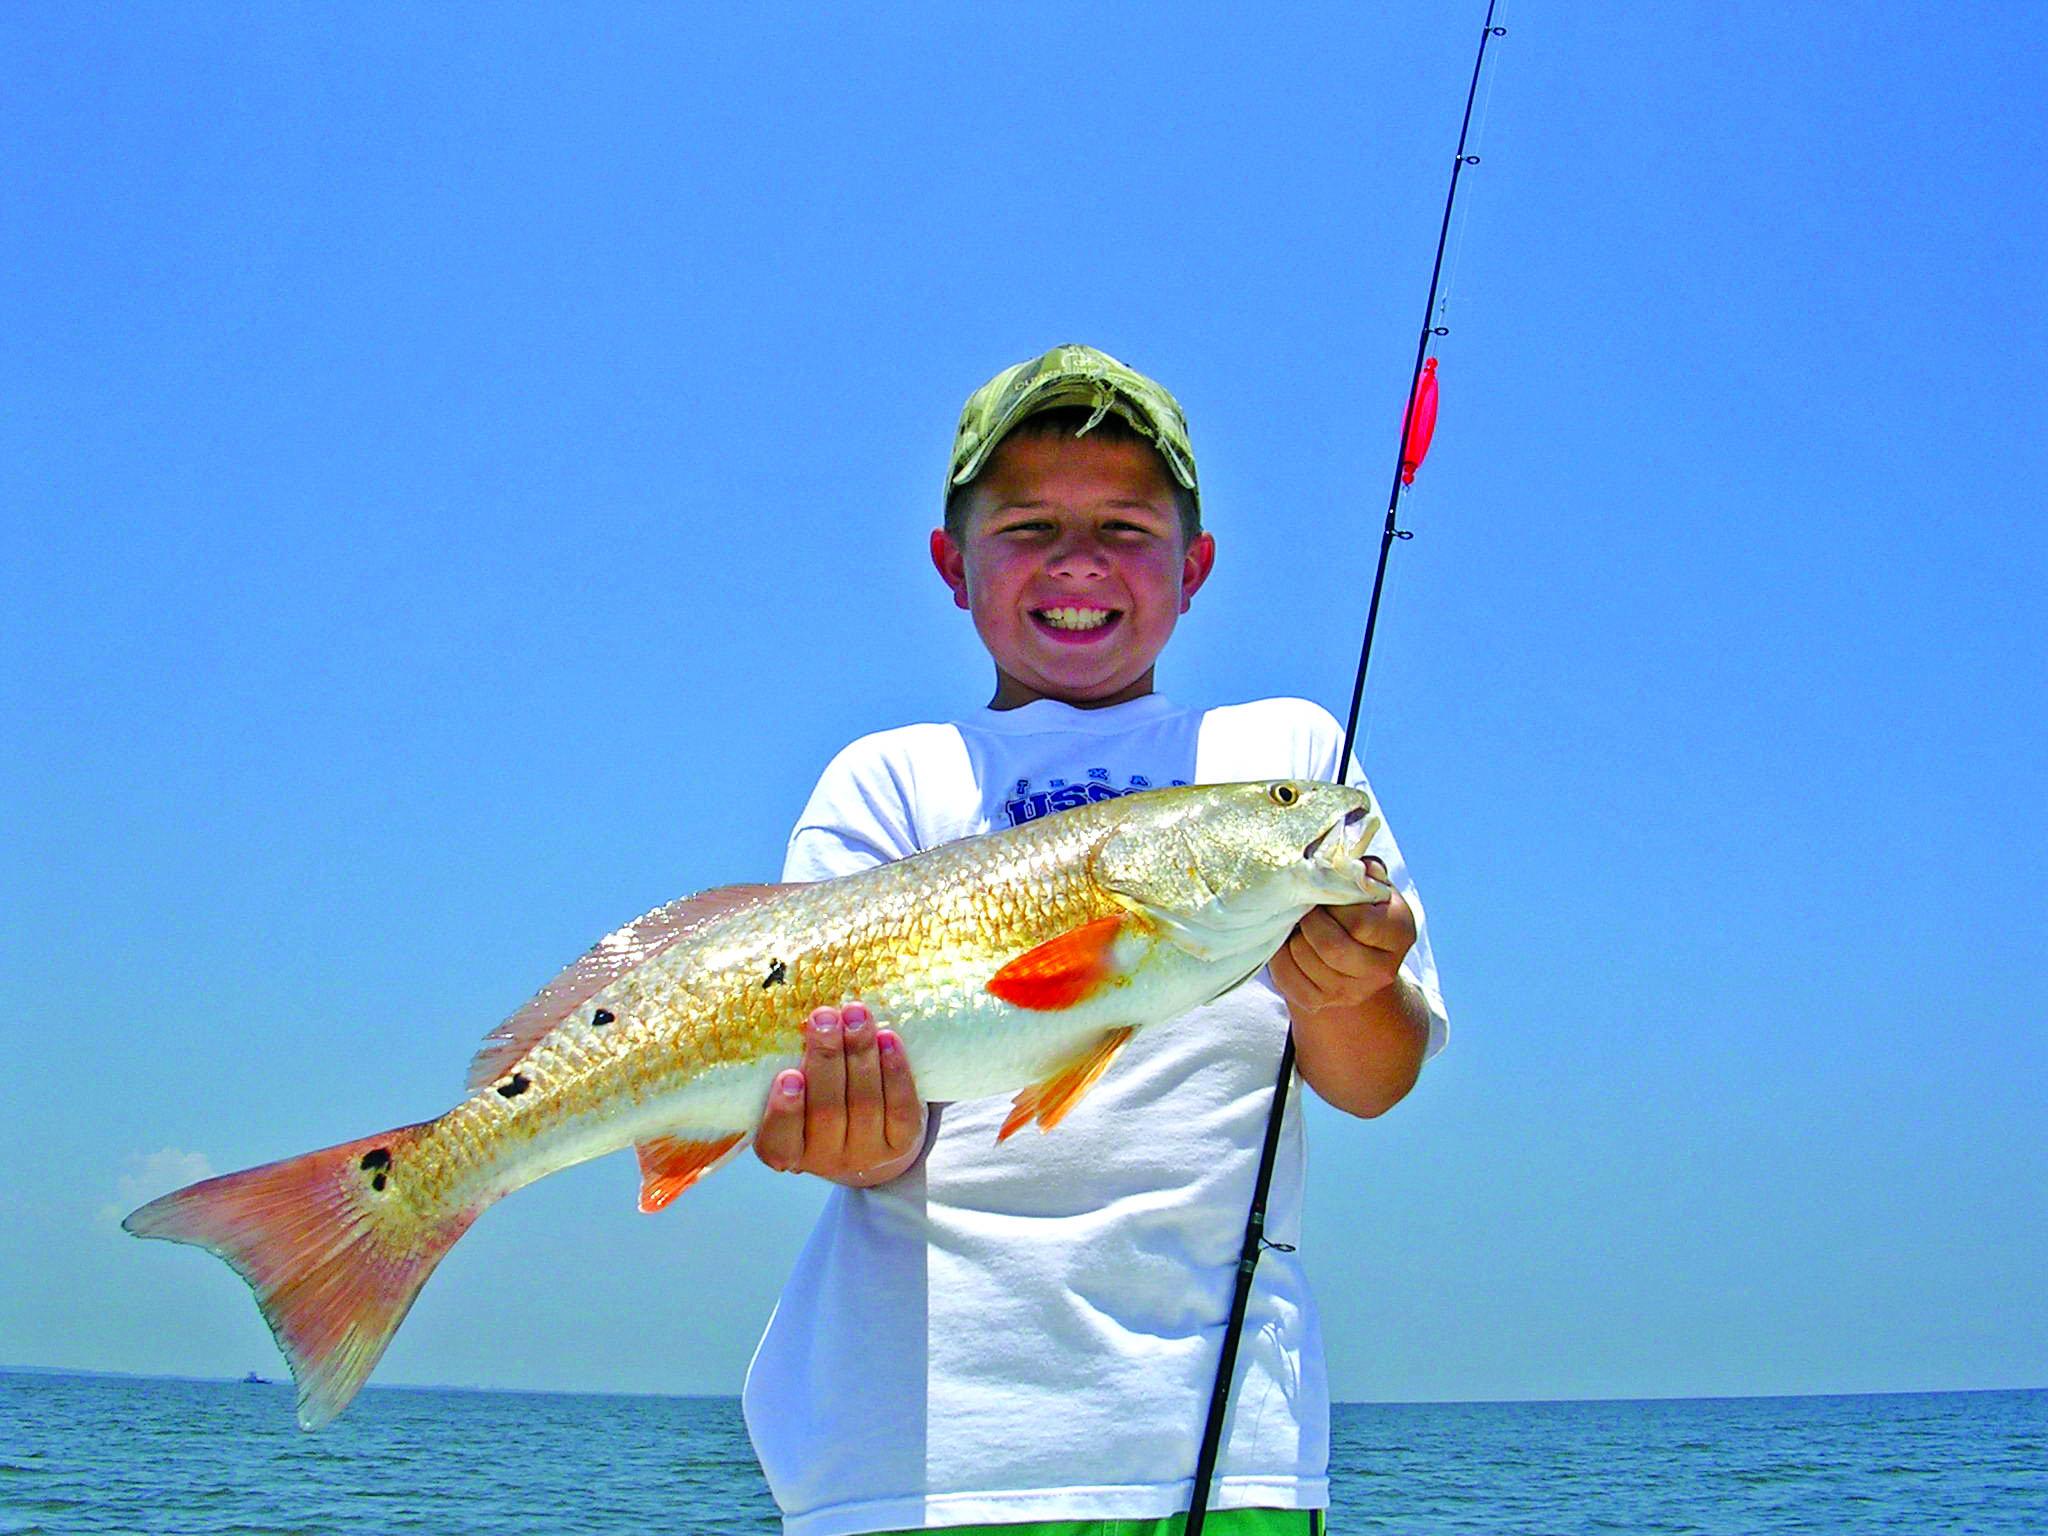 is plenty of fish a good site